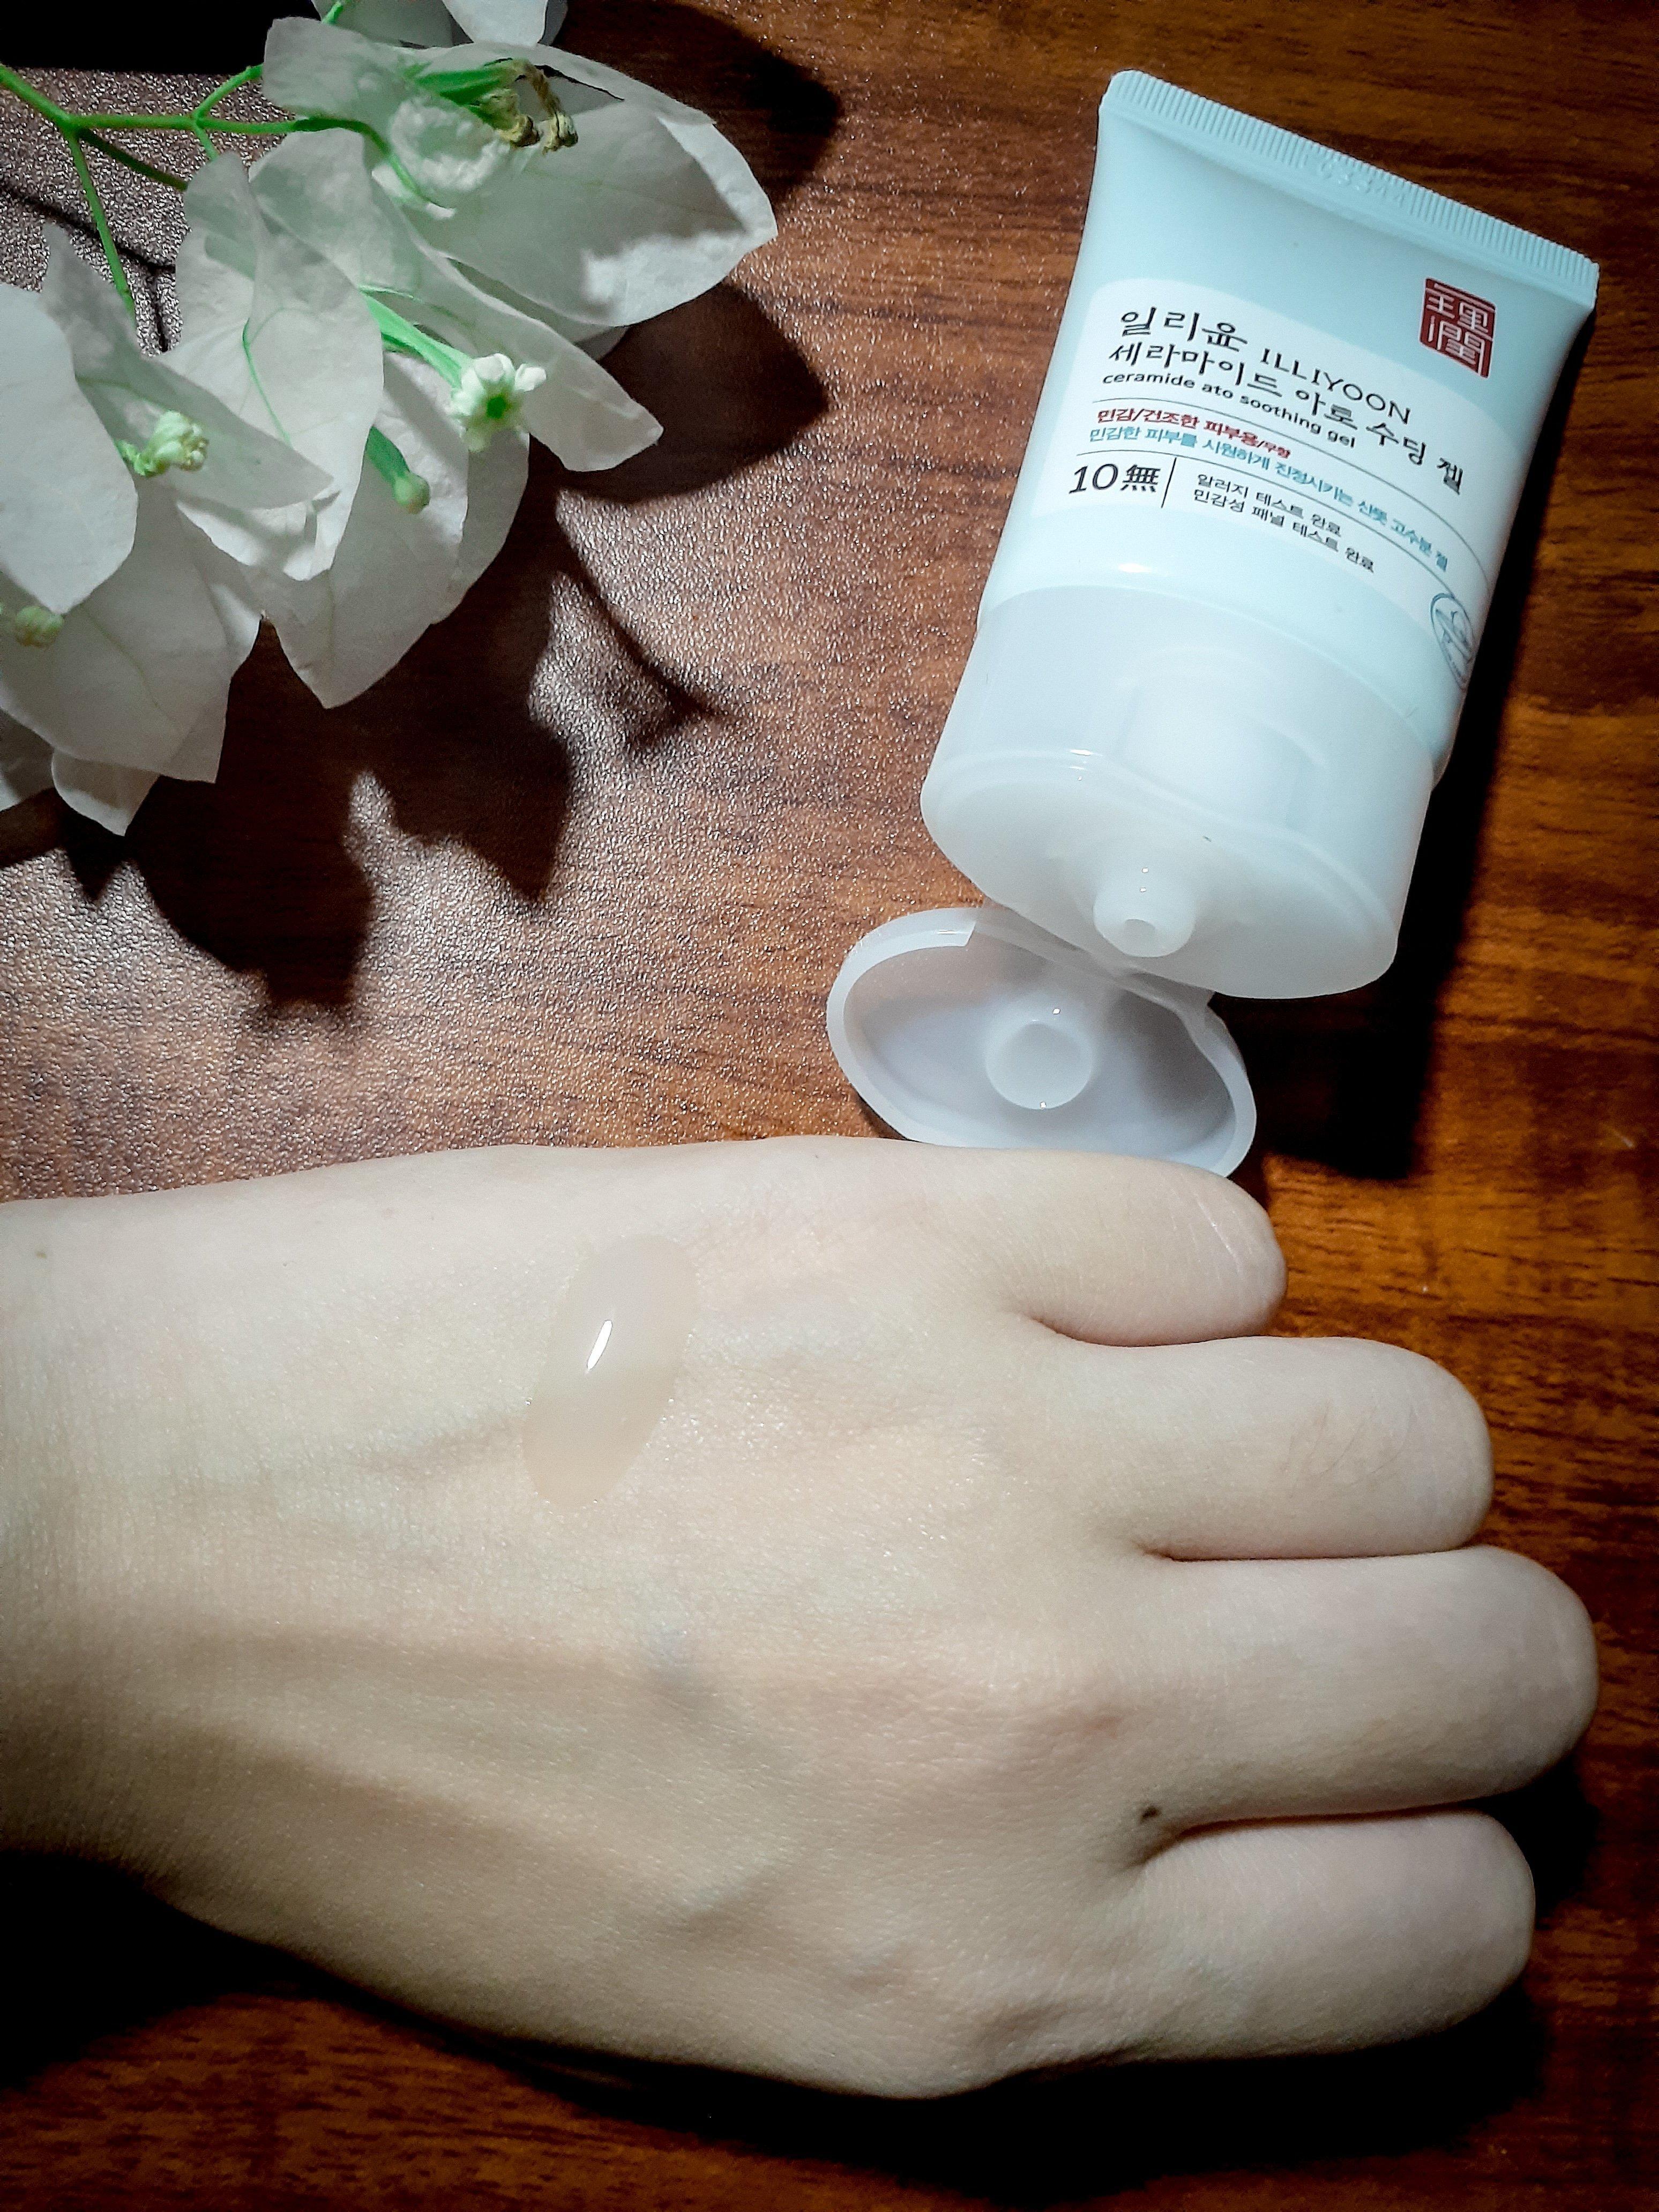 Gel dưỡng ẩm ILLIYOON Ceramide Ato Soothing Gel có texture mỏng, nhẹ, thấm nhanh. (Nguồn: BlogAnChoi.)